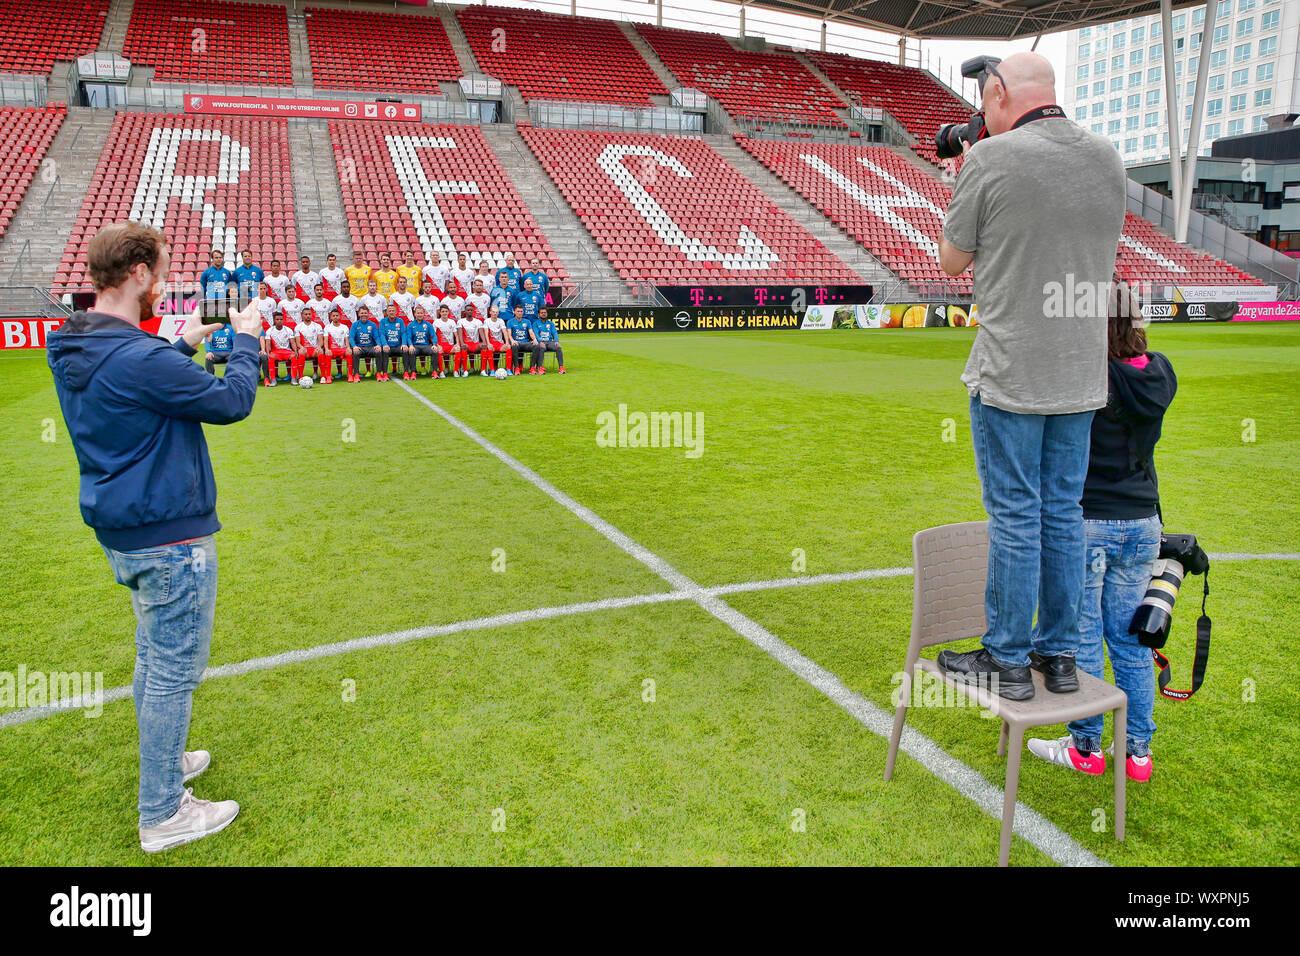 https www alamy com utrecht 17 09 2019 photocall fc utrecht stadion galgenwaard season 2019 2020 dutch eredivisie football club photographer frank zilver r image274636493 html